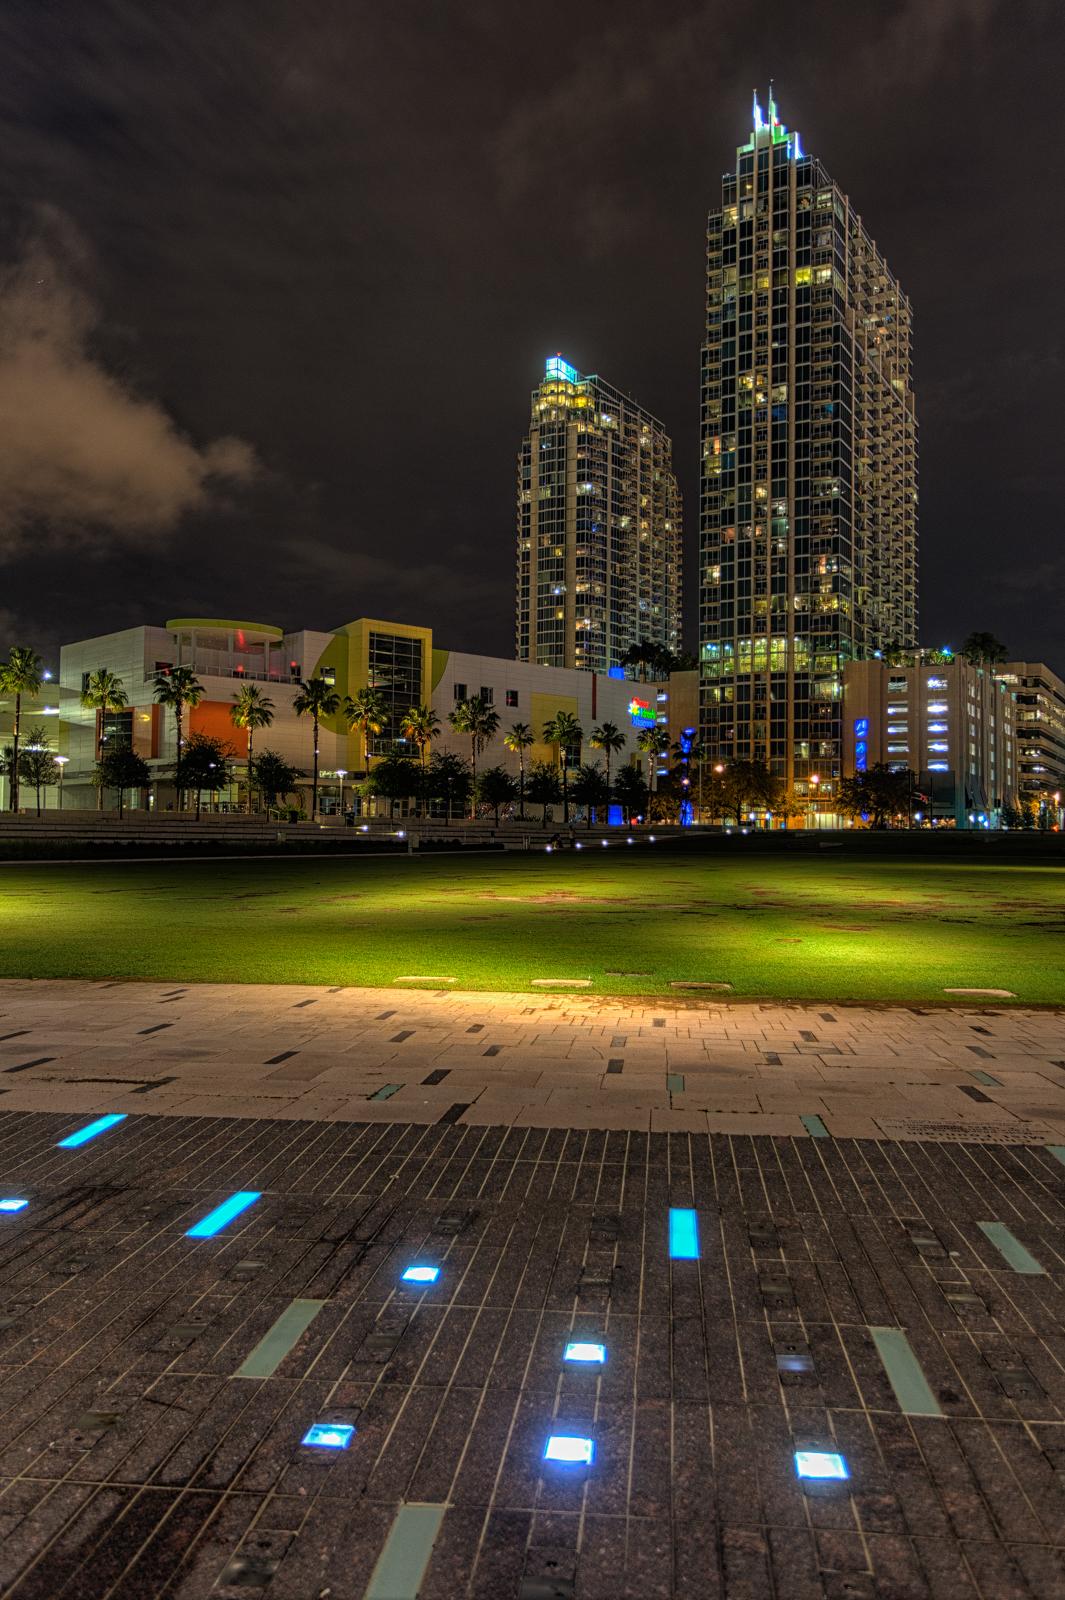 More Tampa Vetical Photos